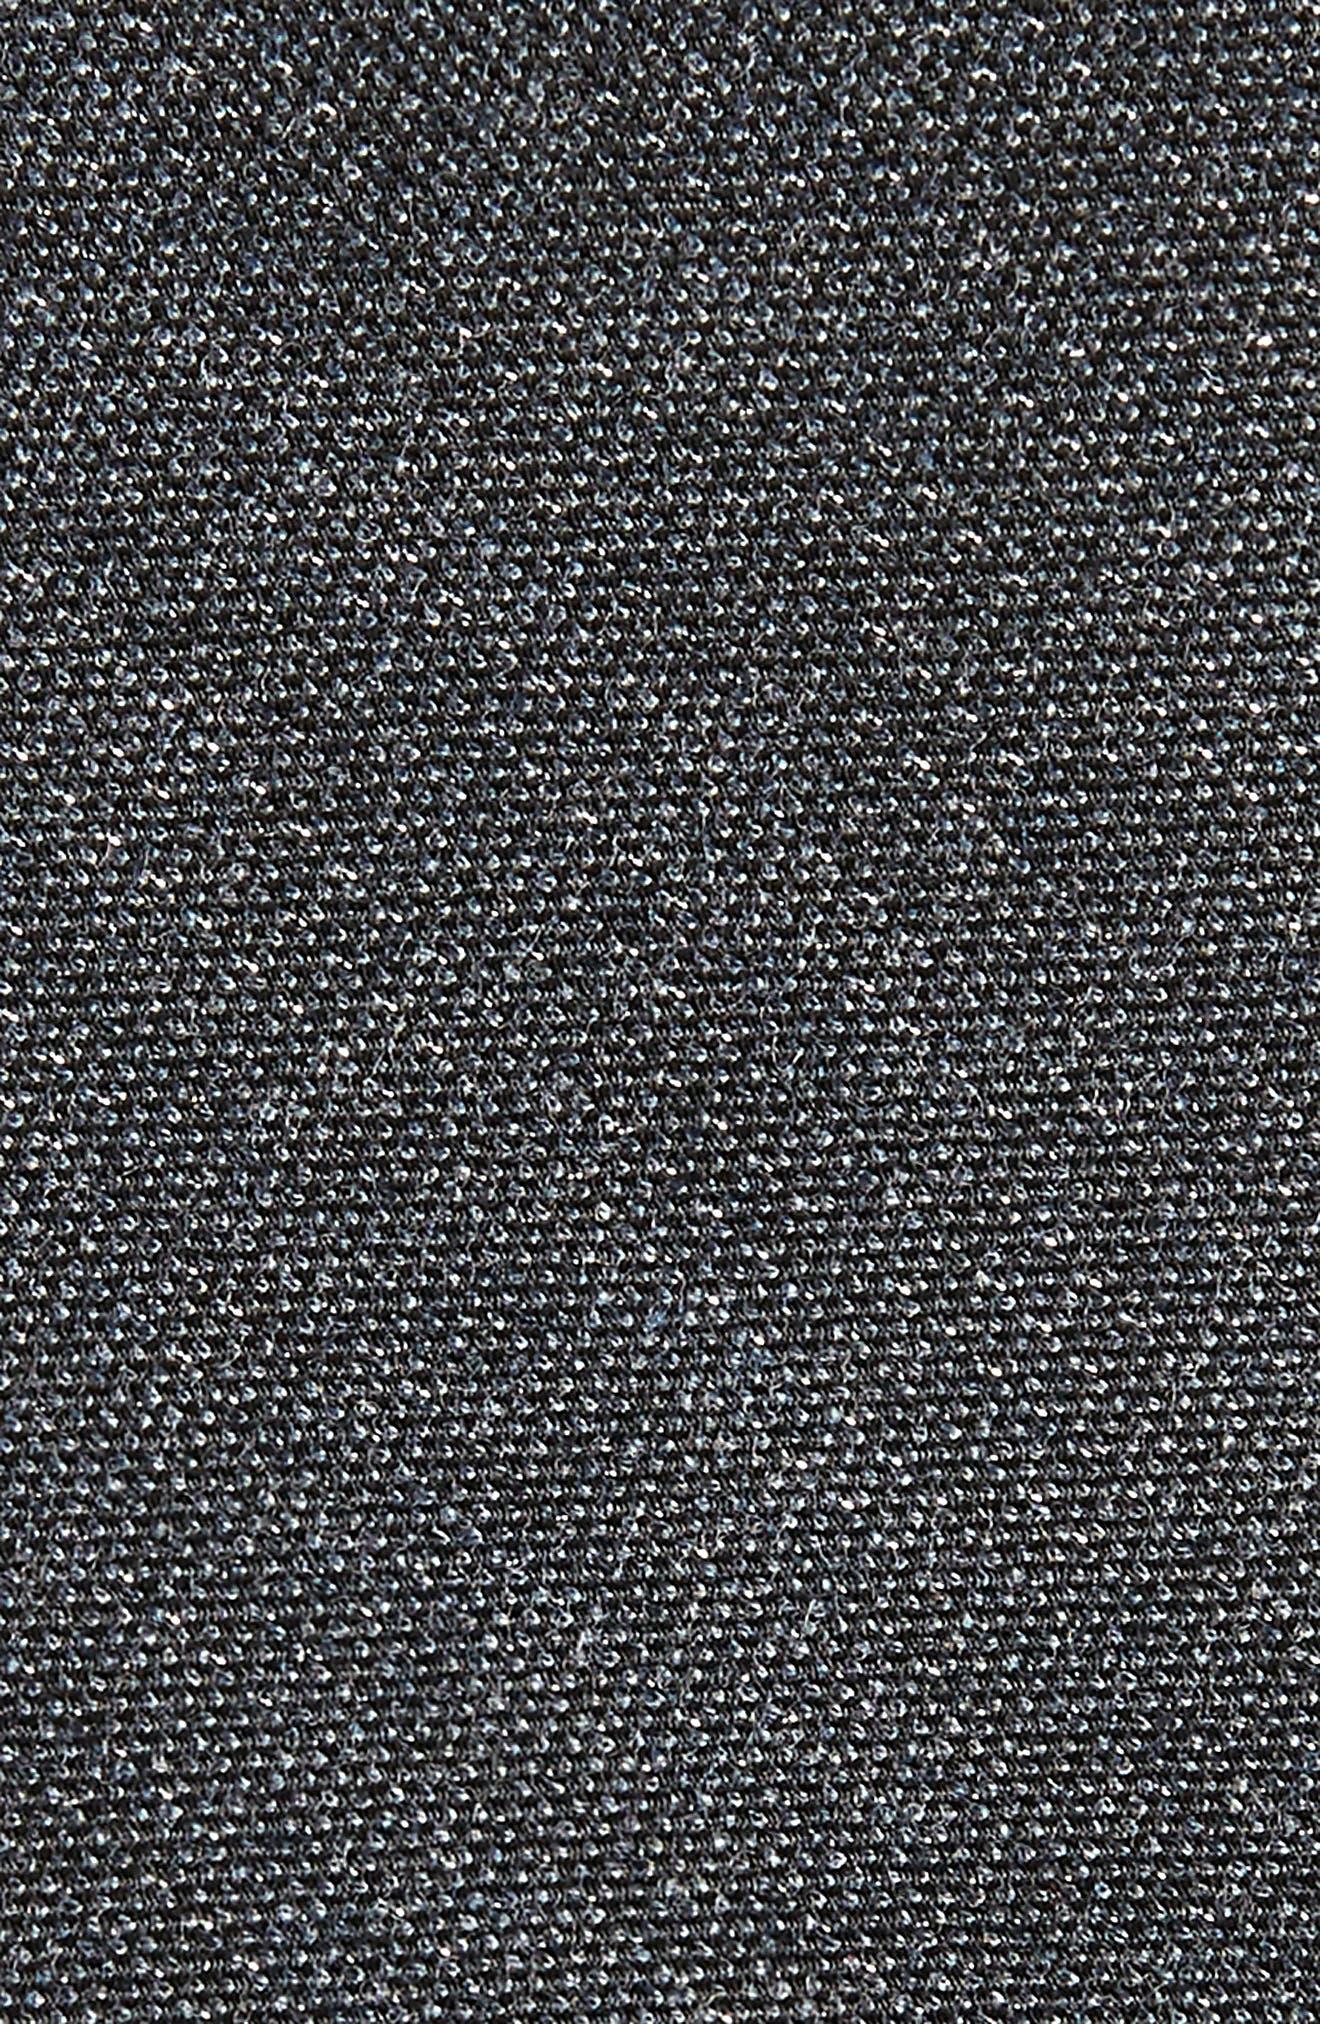 Resolution Silk Blend Tie,                             Alternate thumbnail 2, color,                             001